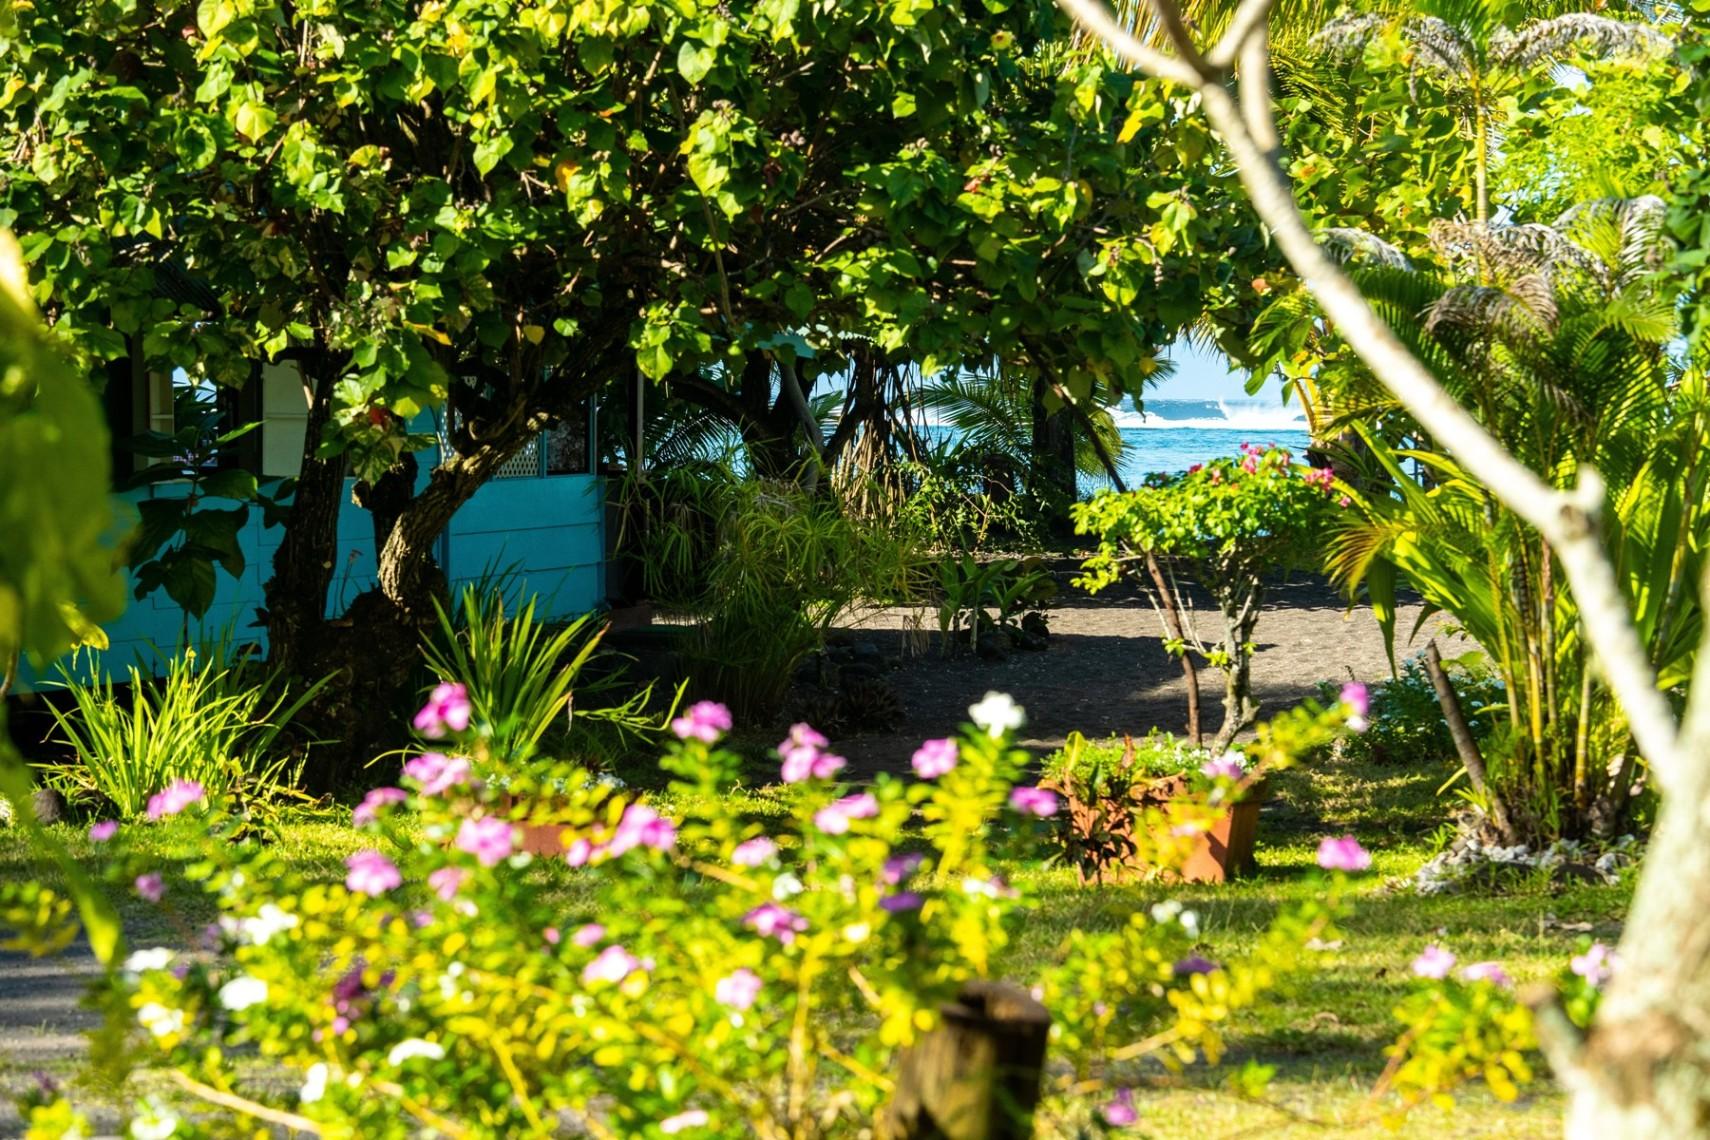 https://tahititourisme.ca/wp-content/uploads/2019/08/copie-tahiti-tourisme-800ko-1.jpg